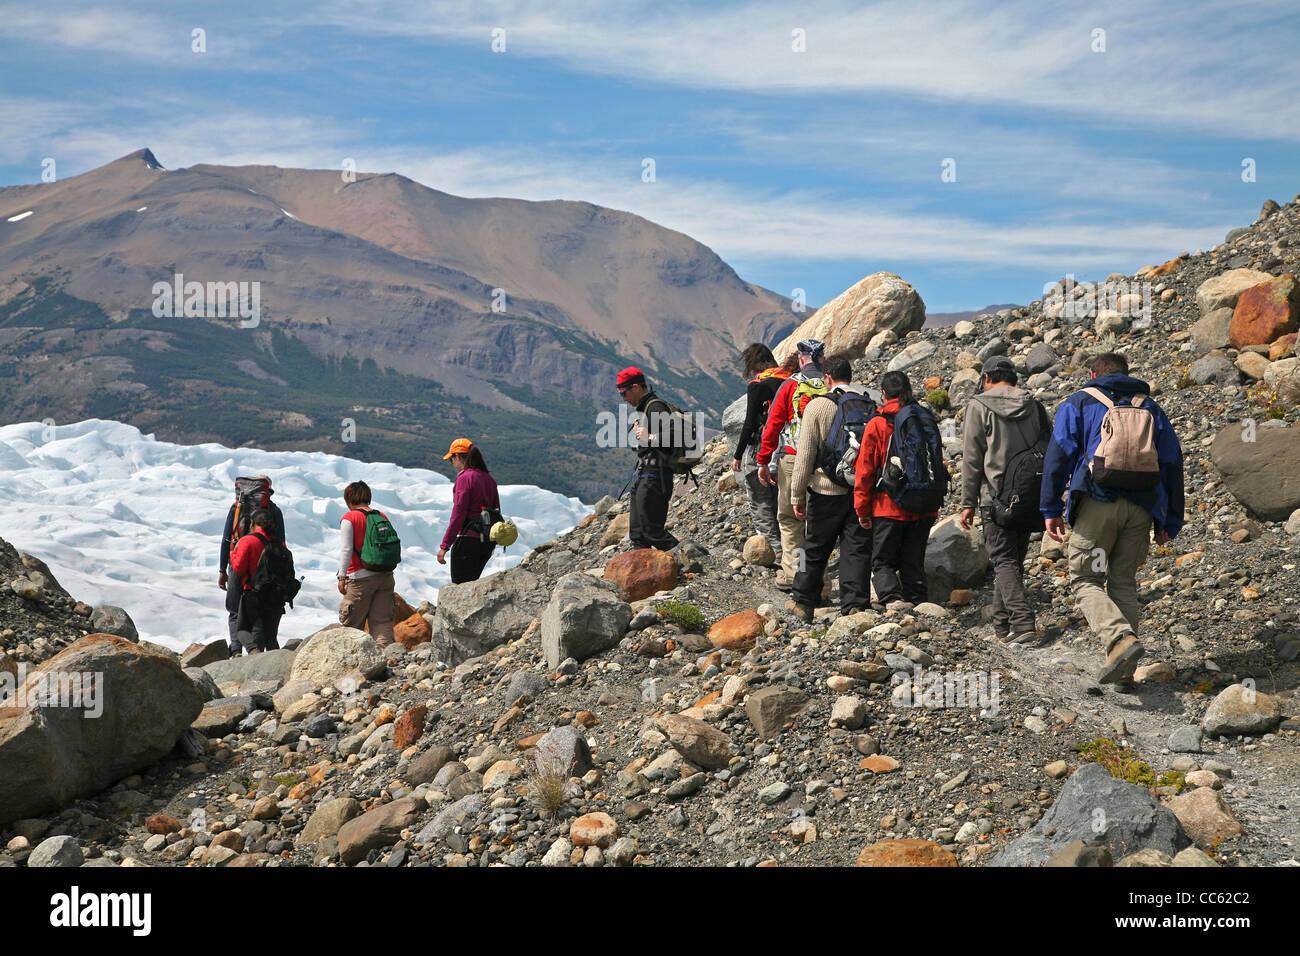 Tourists hiking to the Perito Moreno glacier in the Los Glaciares National Park, Patagonia, Argentina - Stock Image